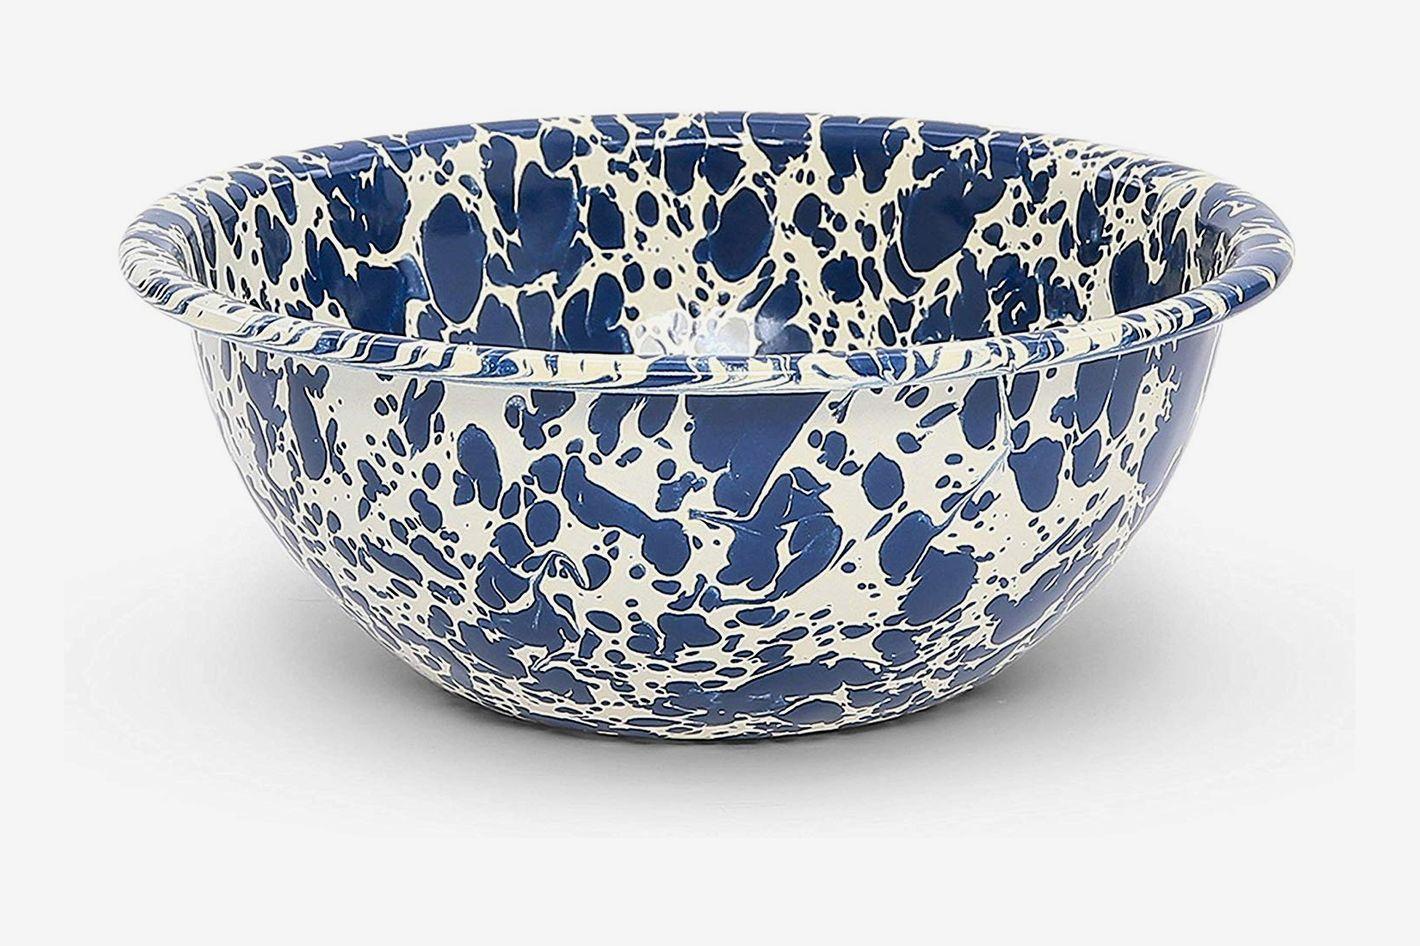 Crow Canyon Home Enamelware Bowl, Navy/Cream Splatter (Set of 4)